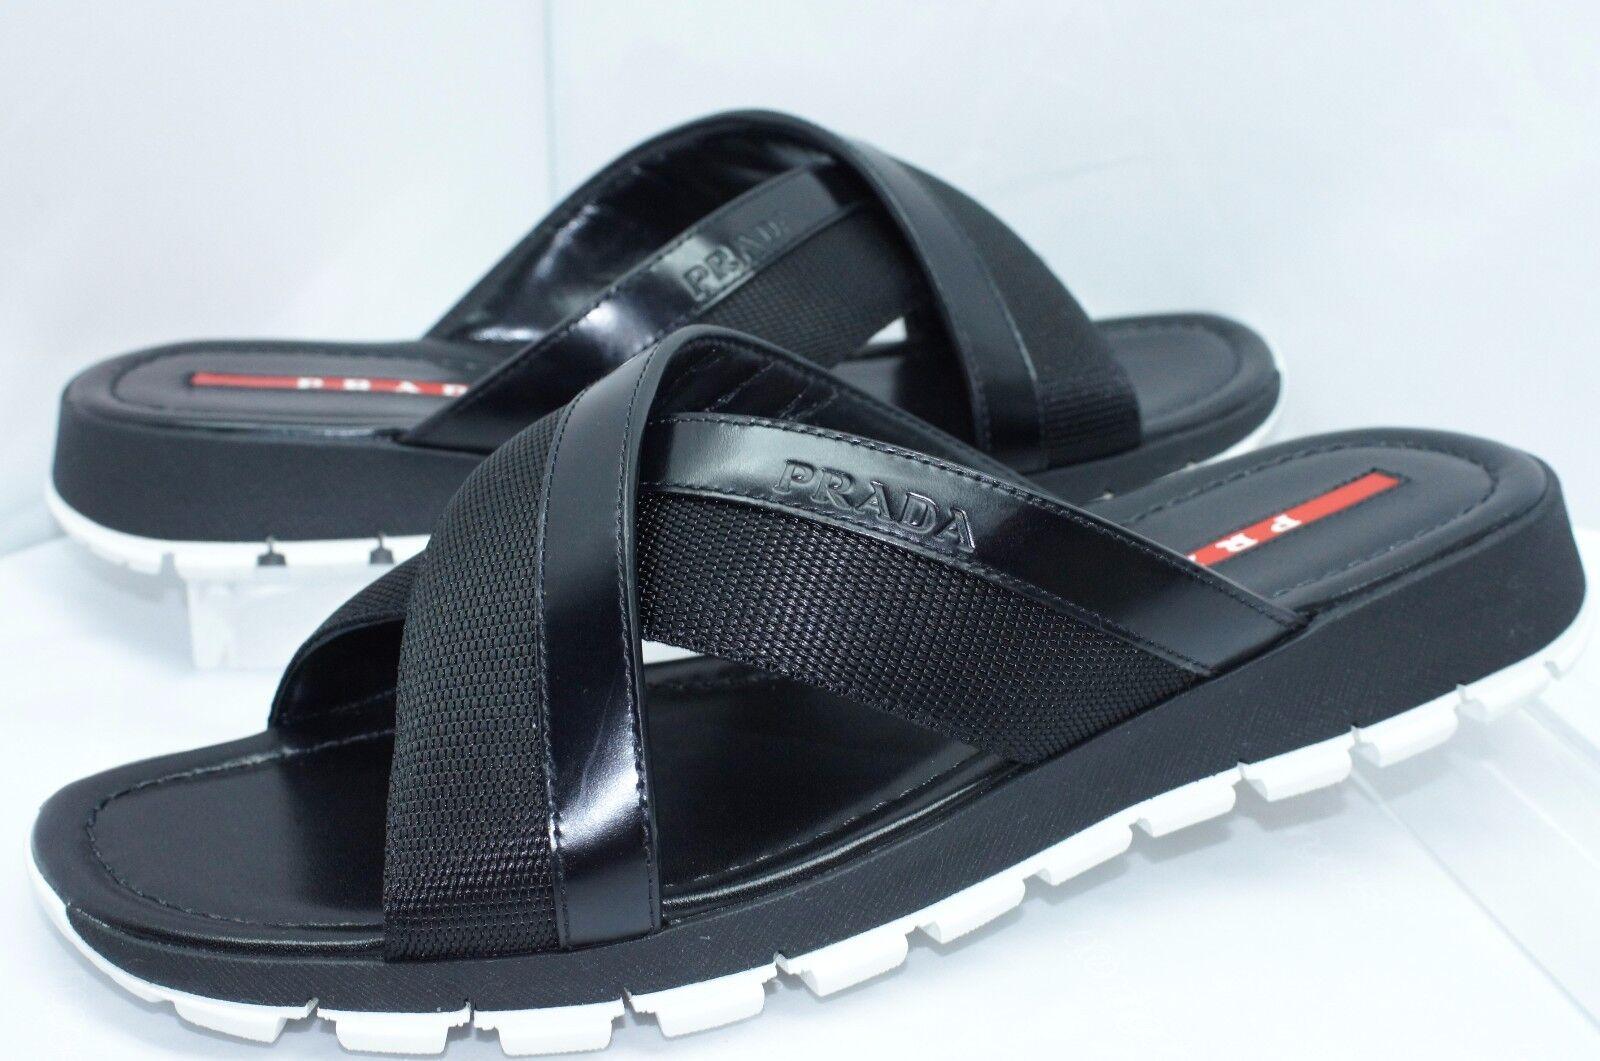 New Prada Men's Sandals shoes Size 8 Black Calzature men Sale